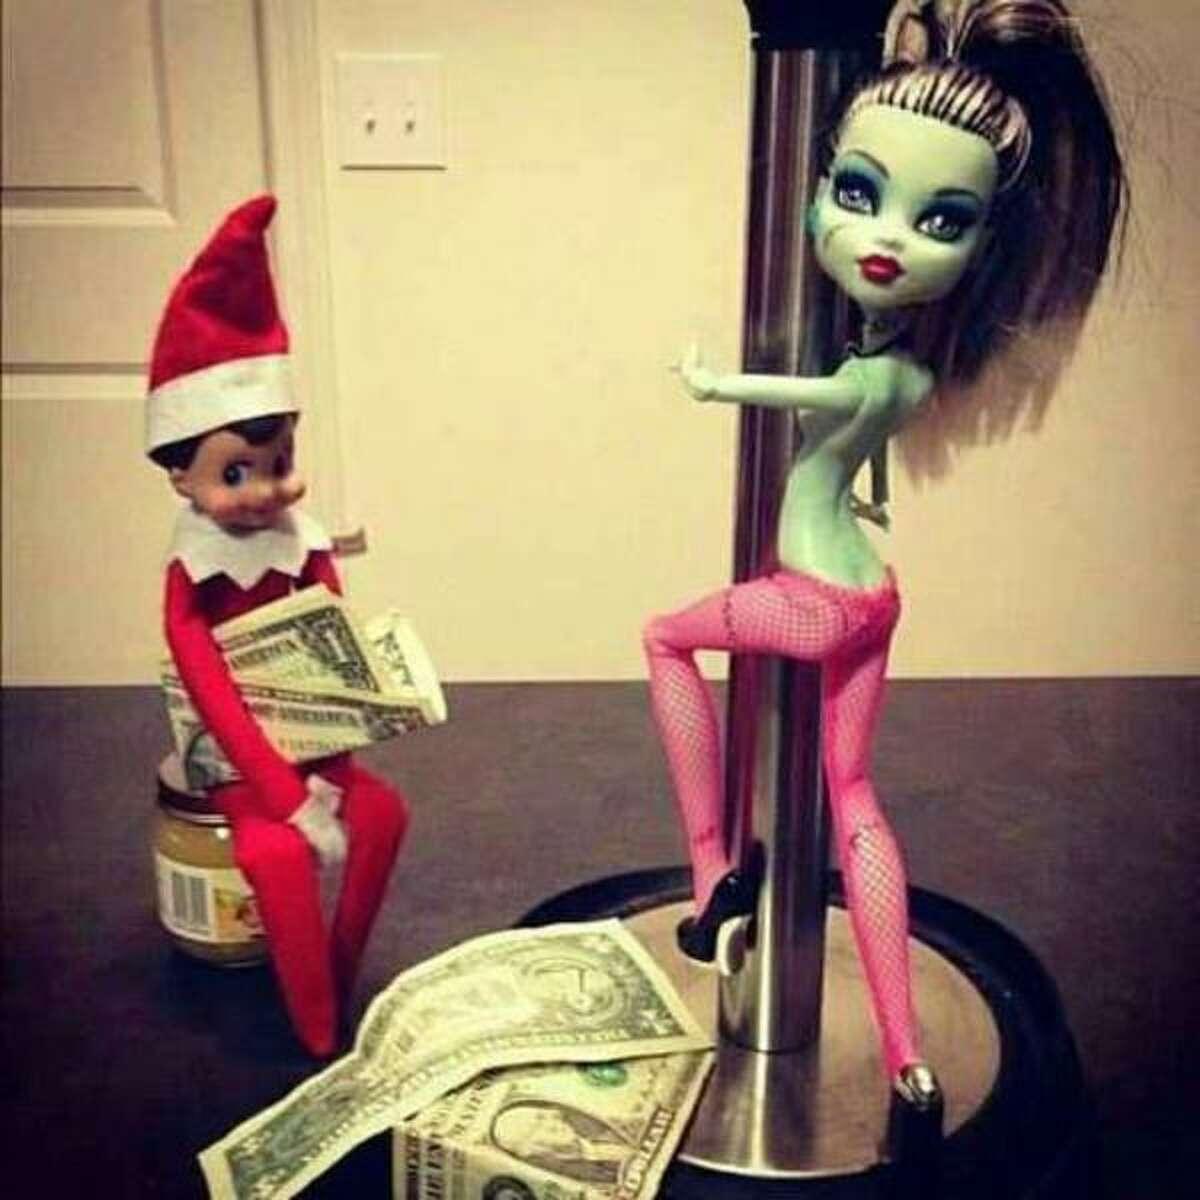 Elf on a Shelf meme via Know Your Meme